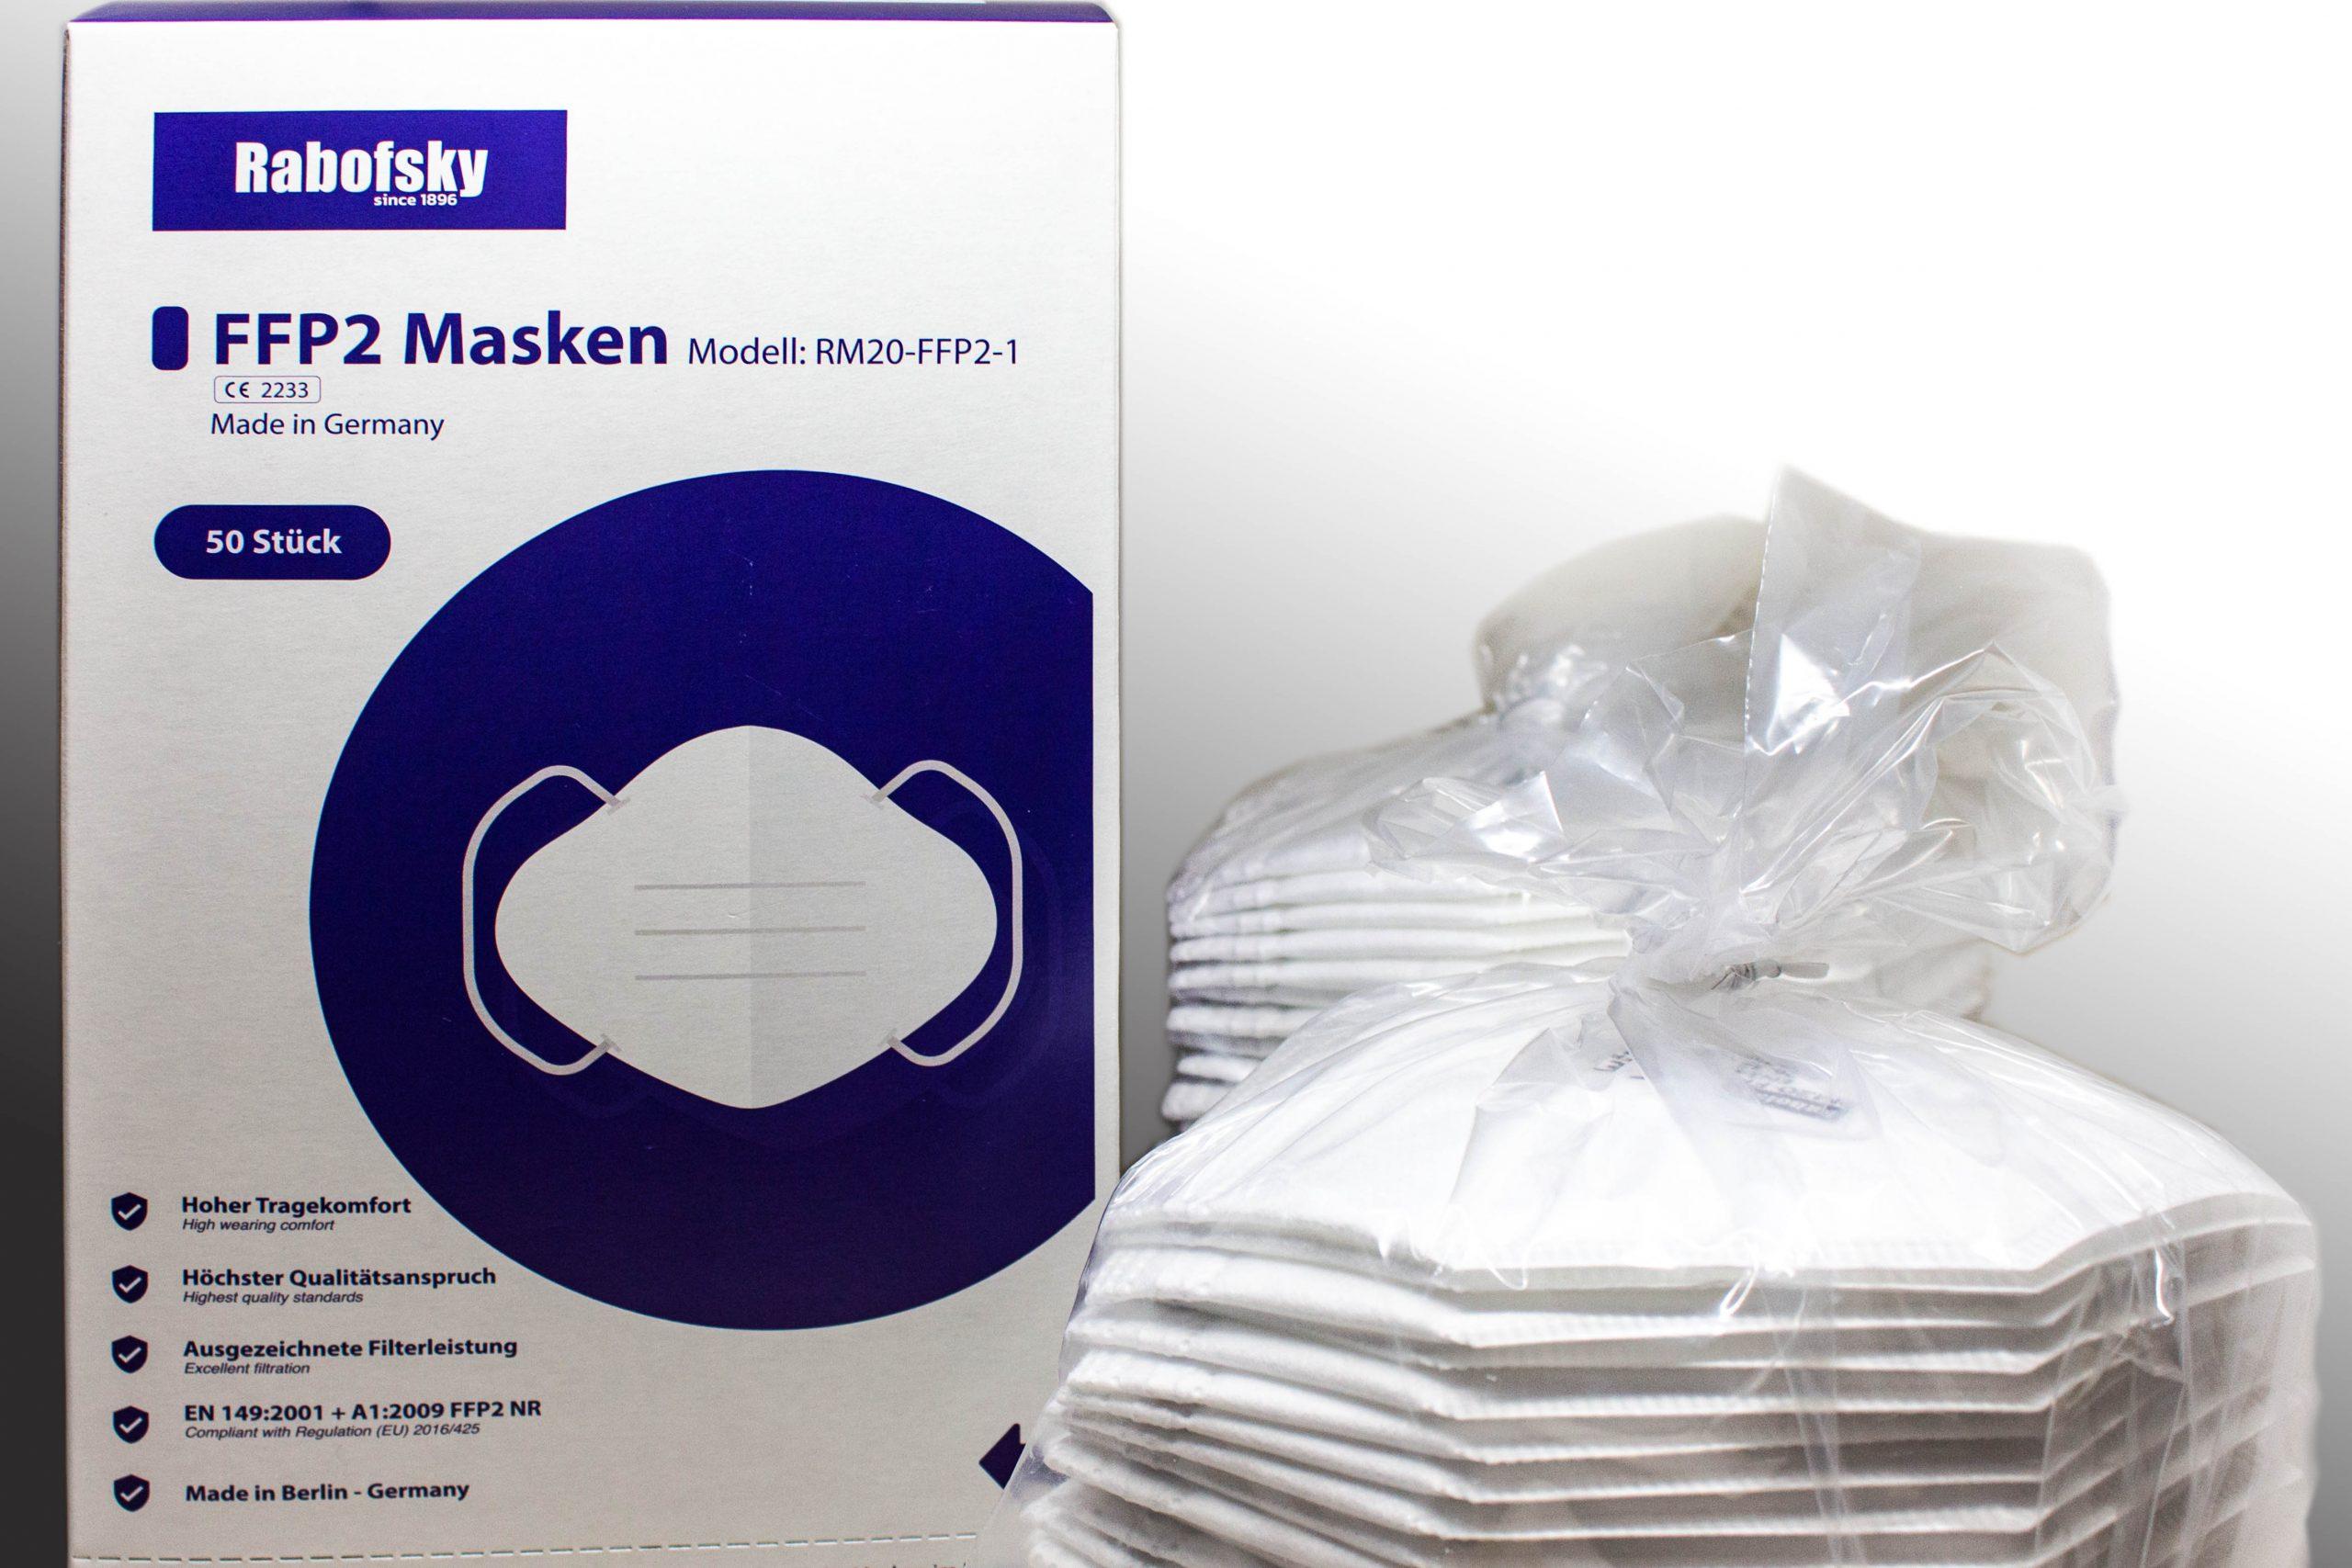 FFP2 - Masken Made in Berlin (Karl Rabofsky)